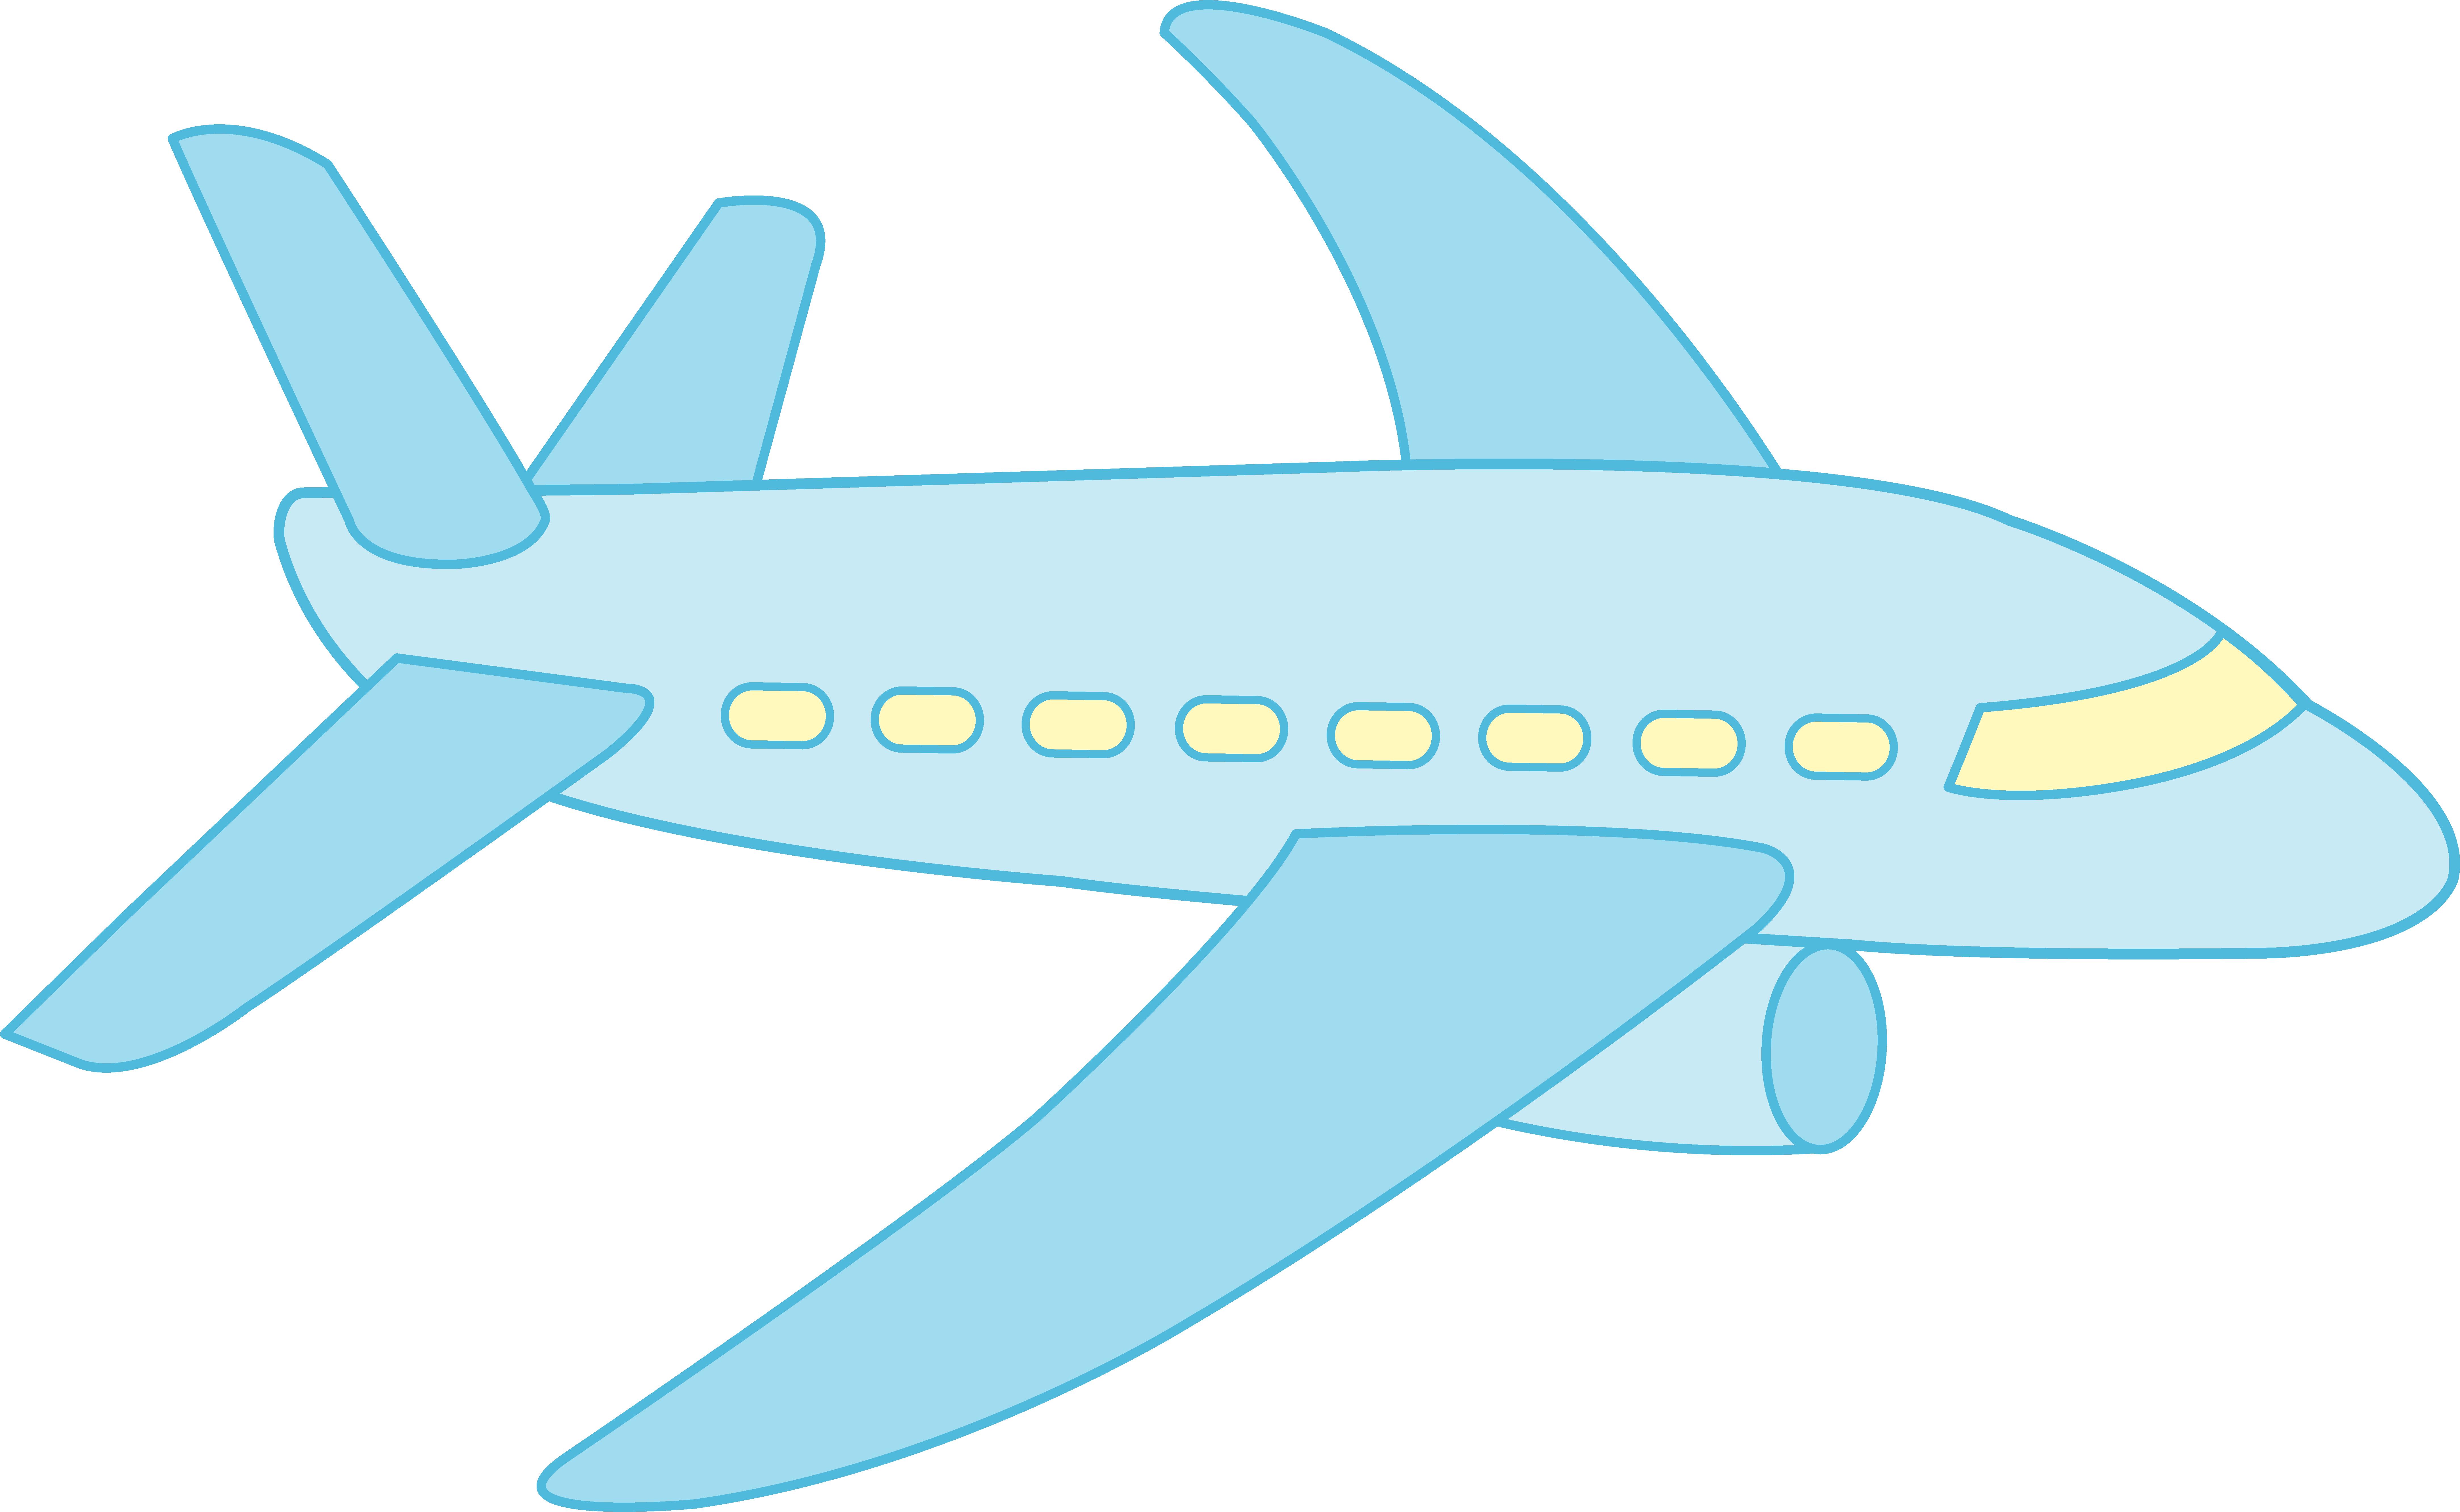 8669x5328 Blue Plane Cliparts Free Download Clip Art